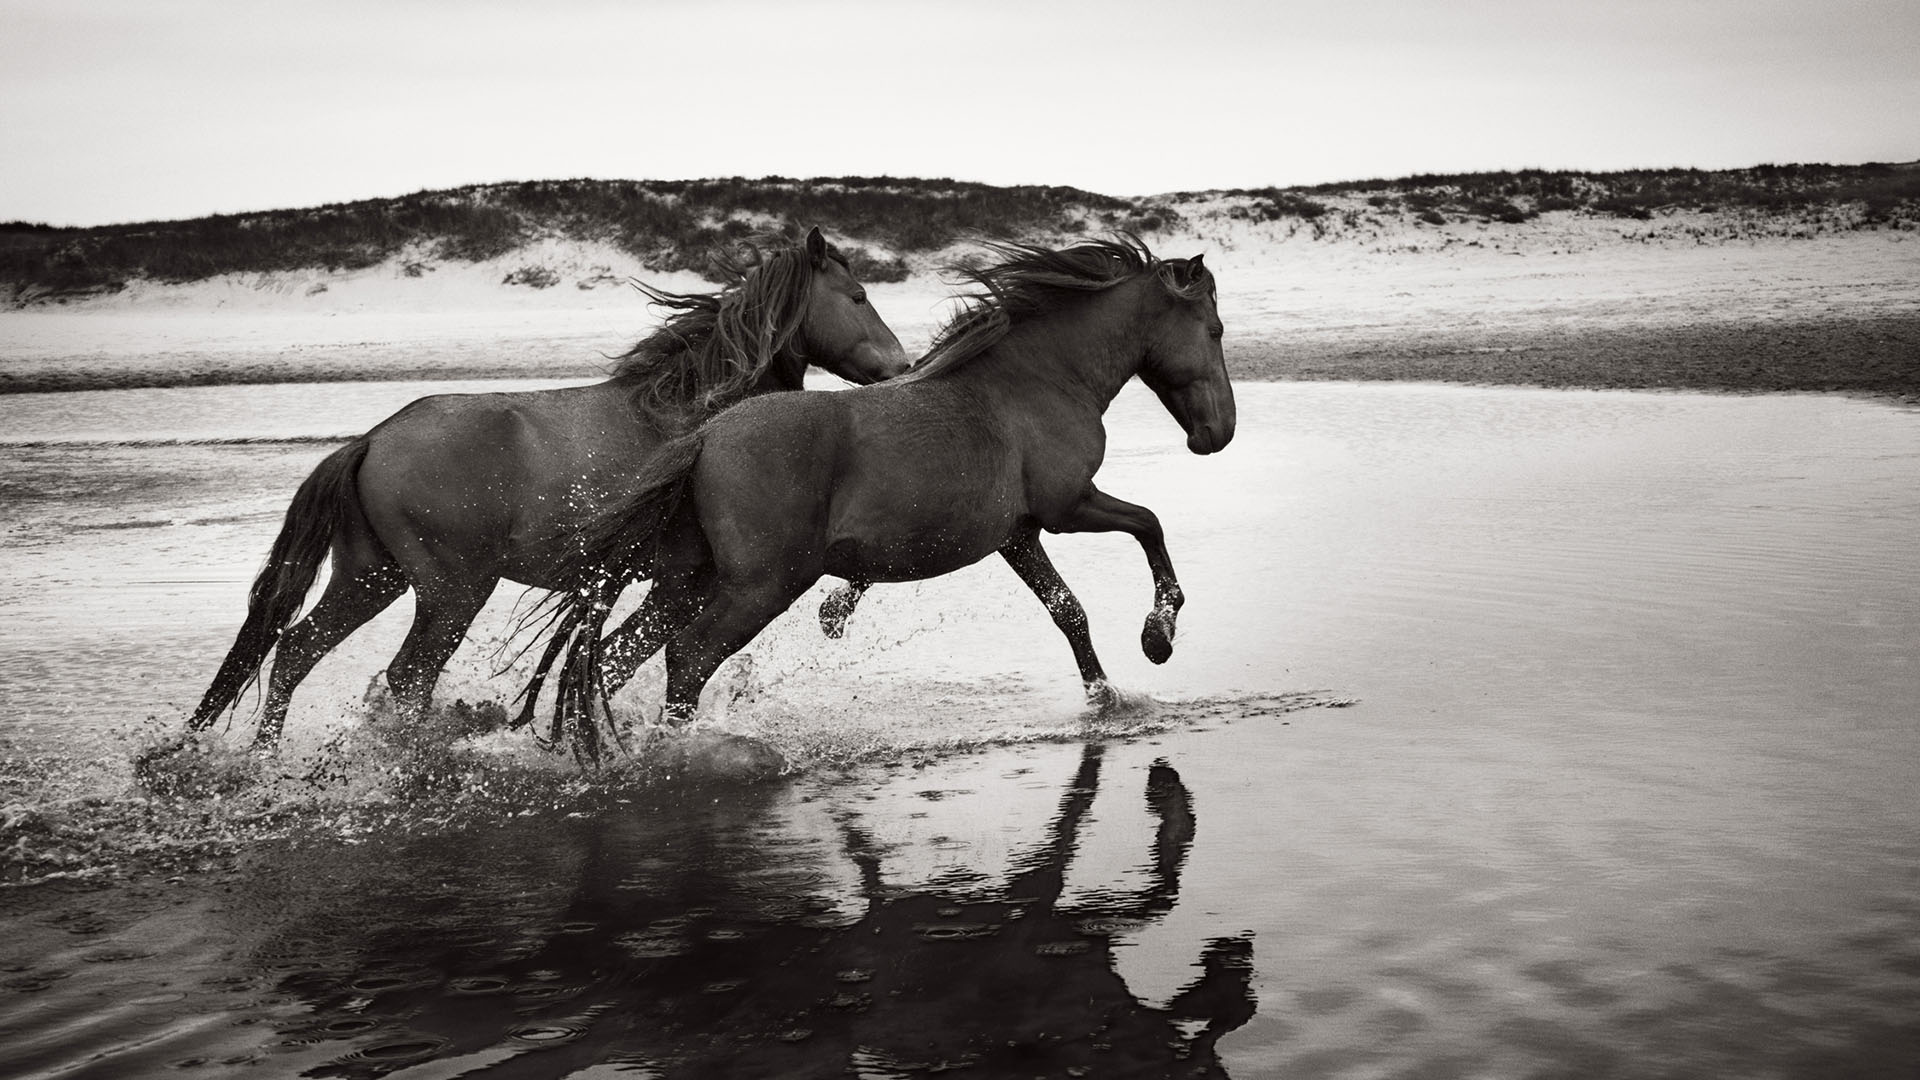 Sable-Island-Wild-Horses-Drew-Doggett-Soulmates_MASTER.jpg